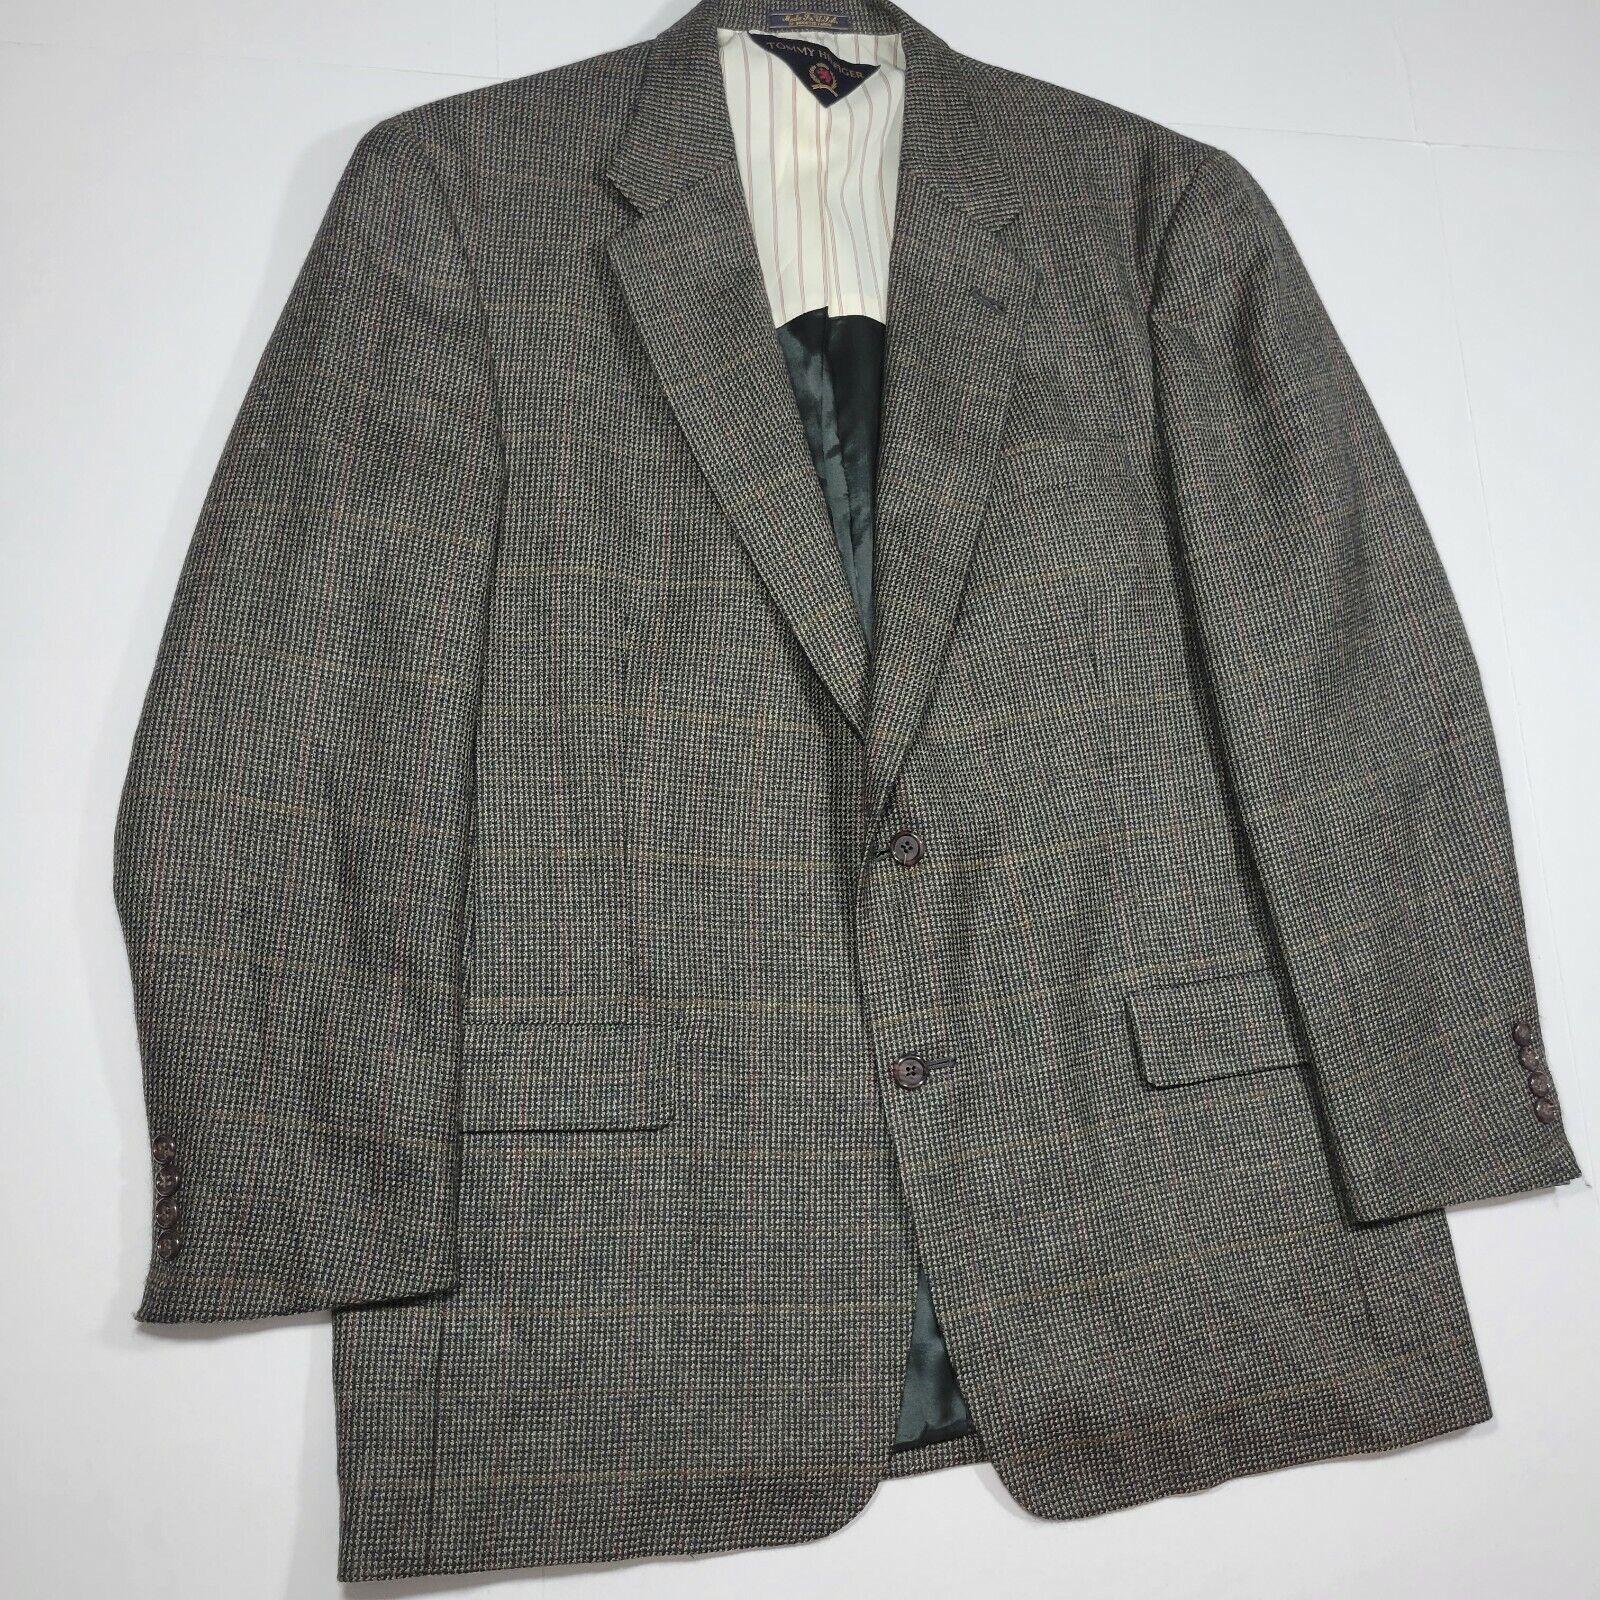 Tommy Hilfiger Sport Coat Blazer - Gray Multi Col… - image 9